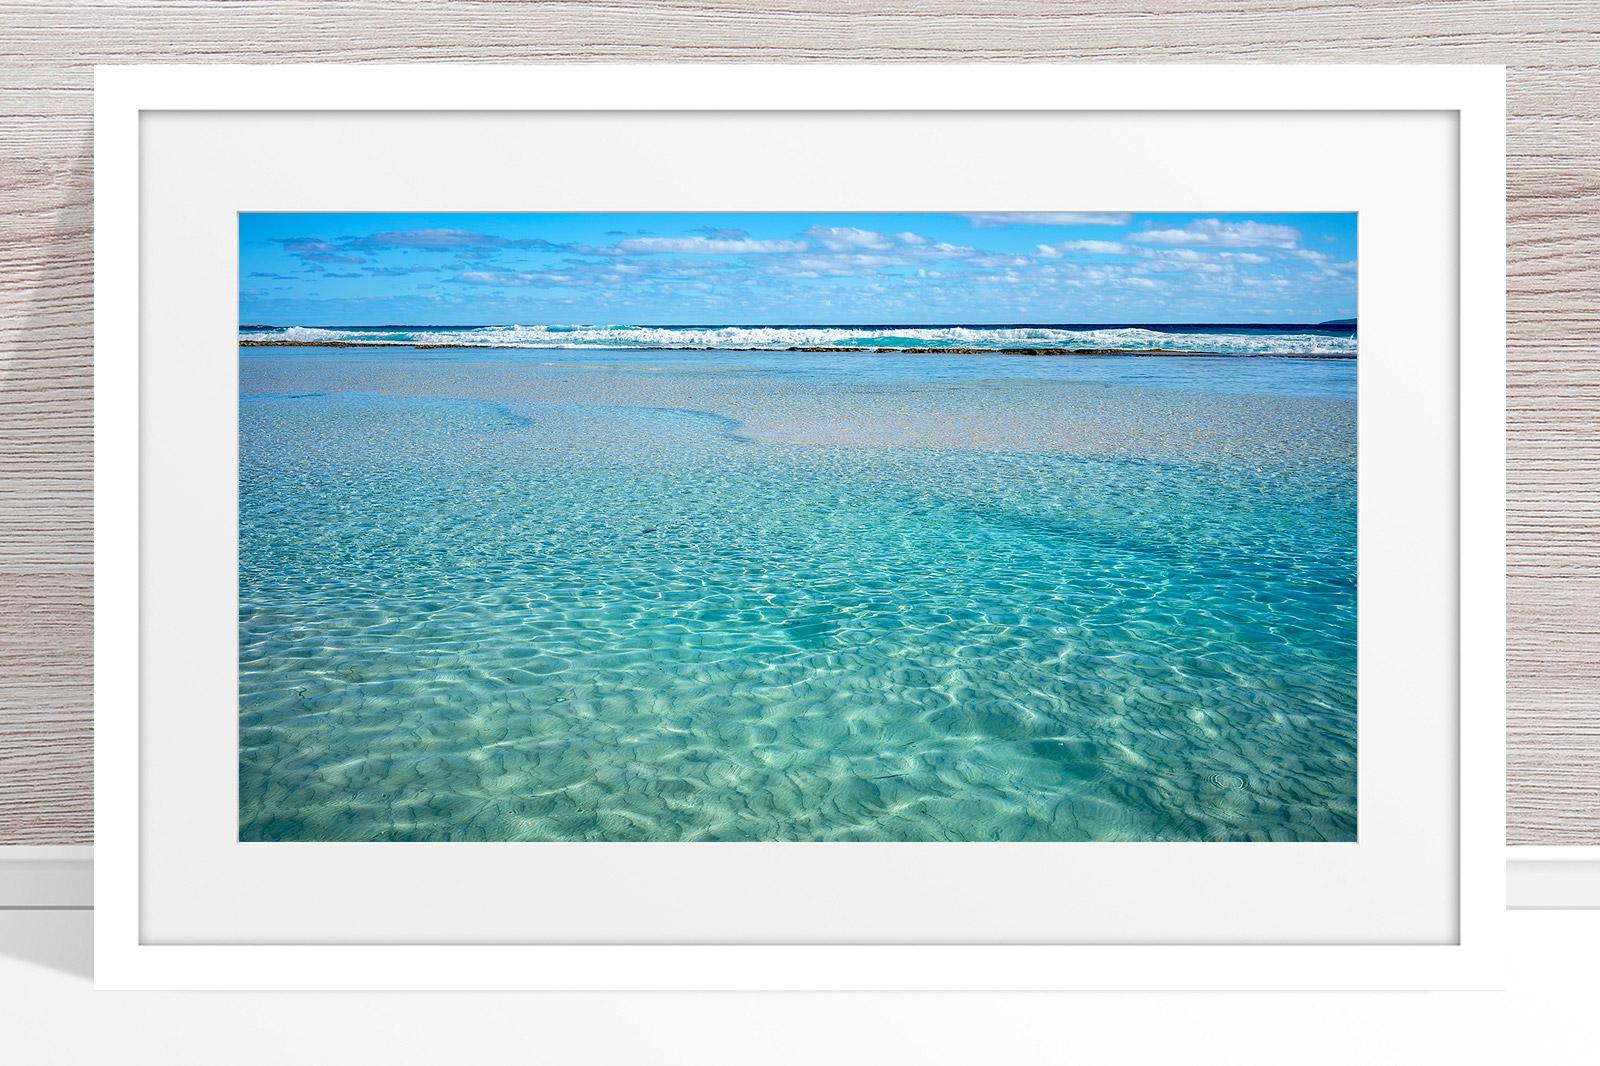 002 - Jason Mazur - 'Crystal Clear Waters, Esperance' White Frame